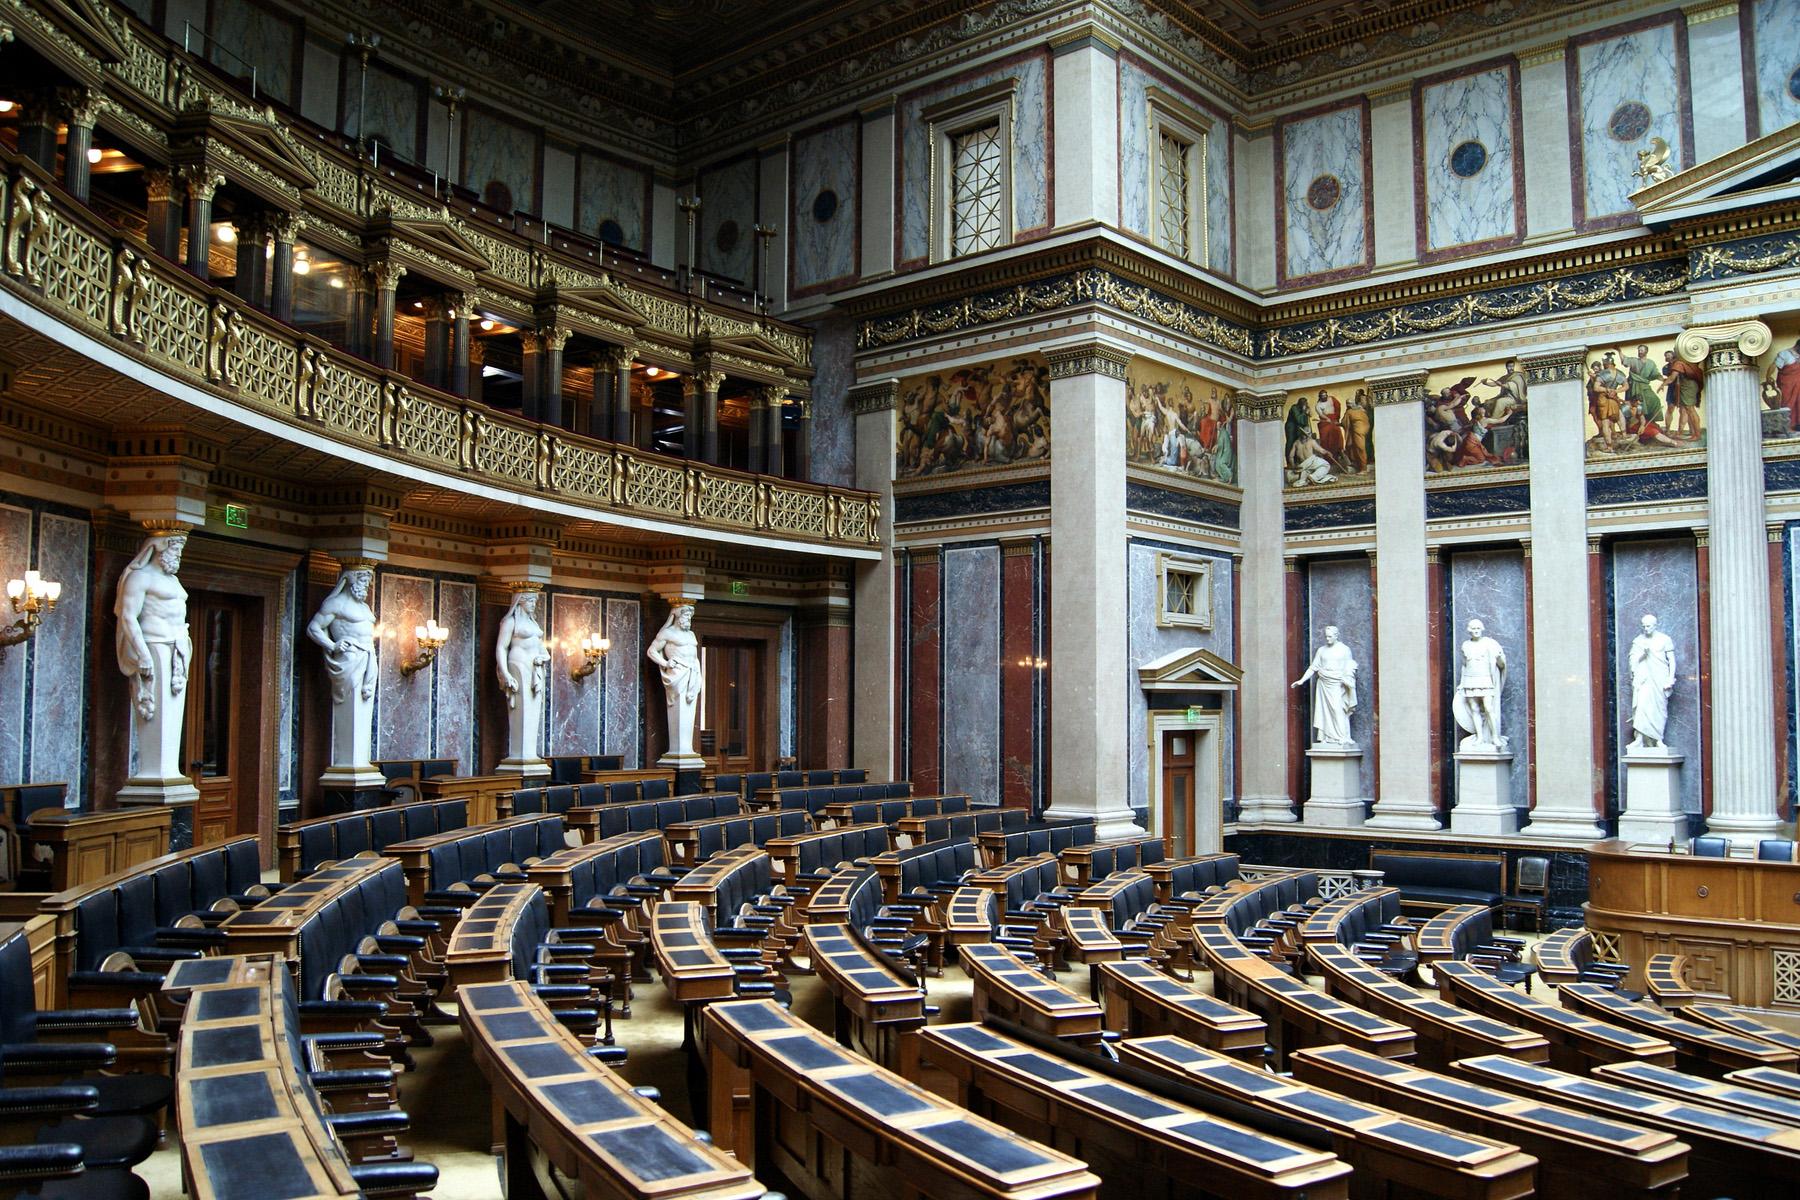 Interior of the Austrian Parliament